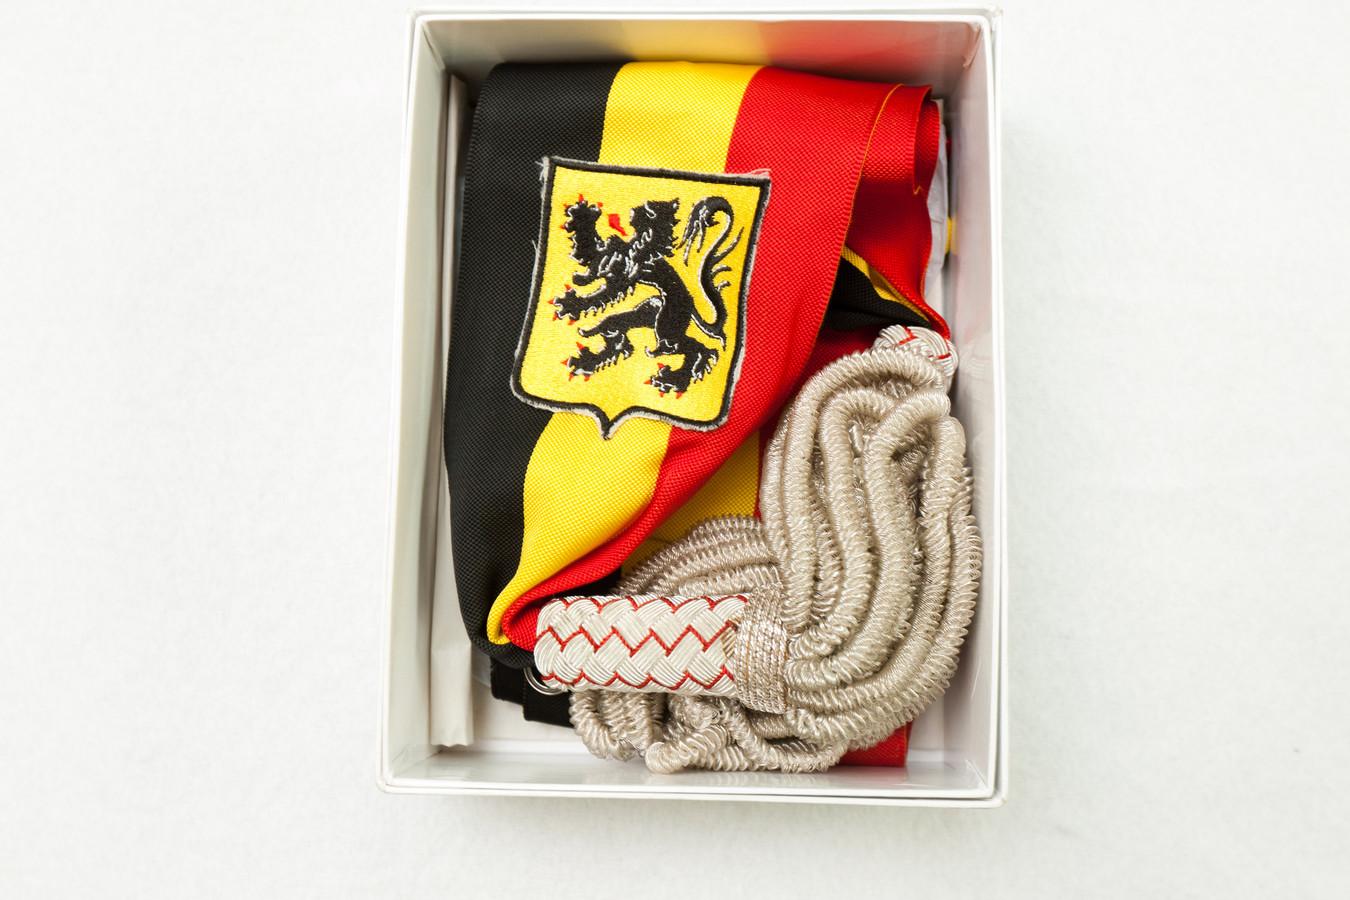 De tricolore sjerp